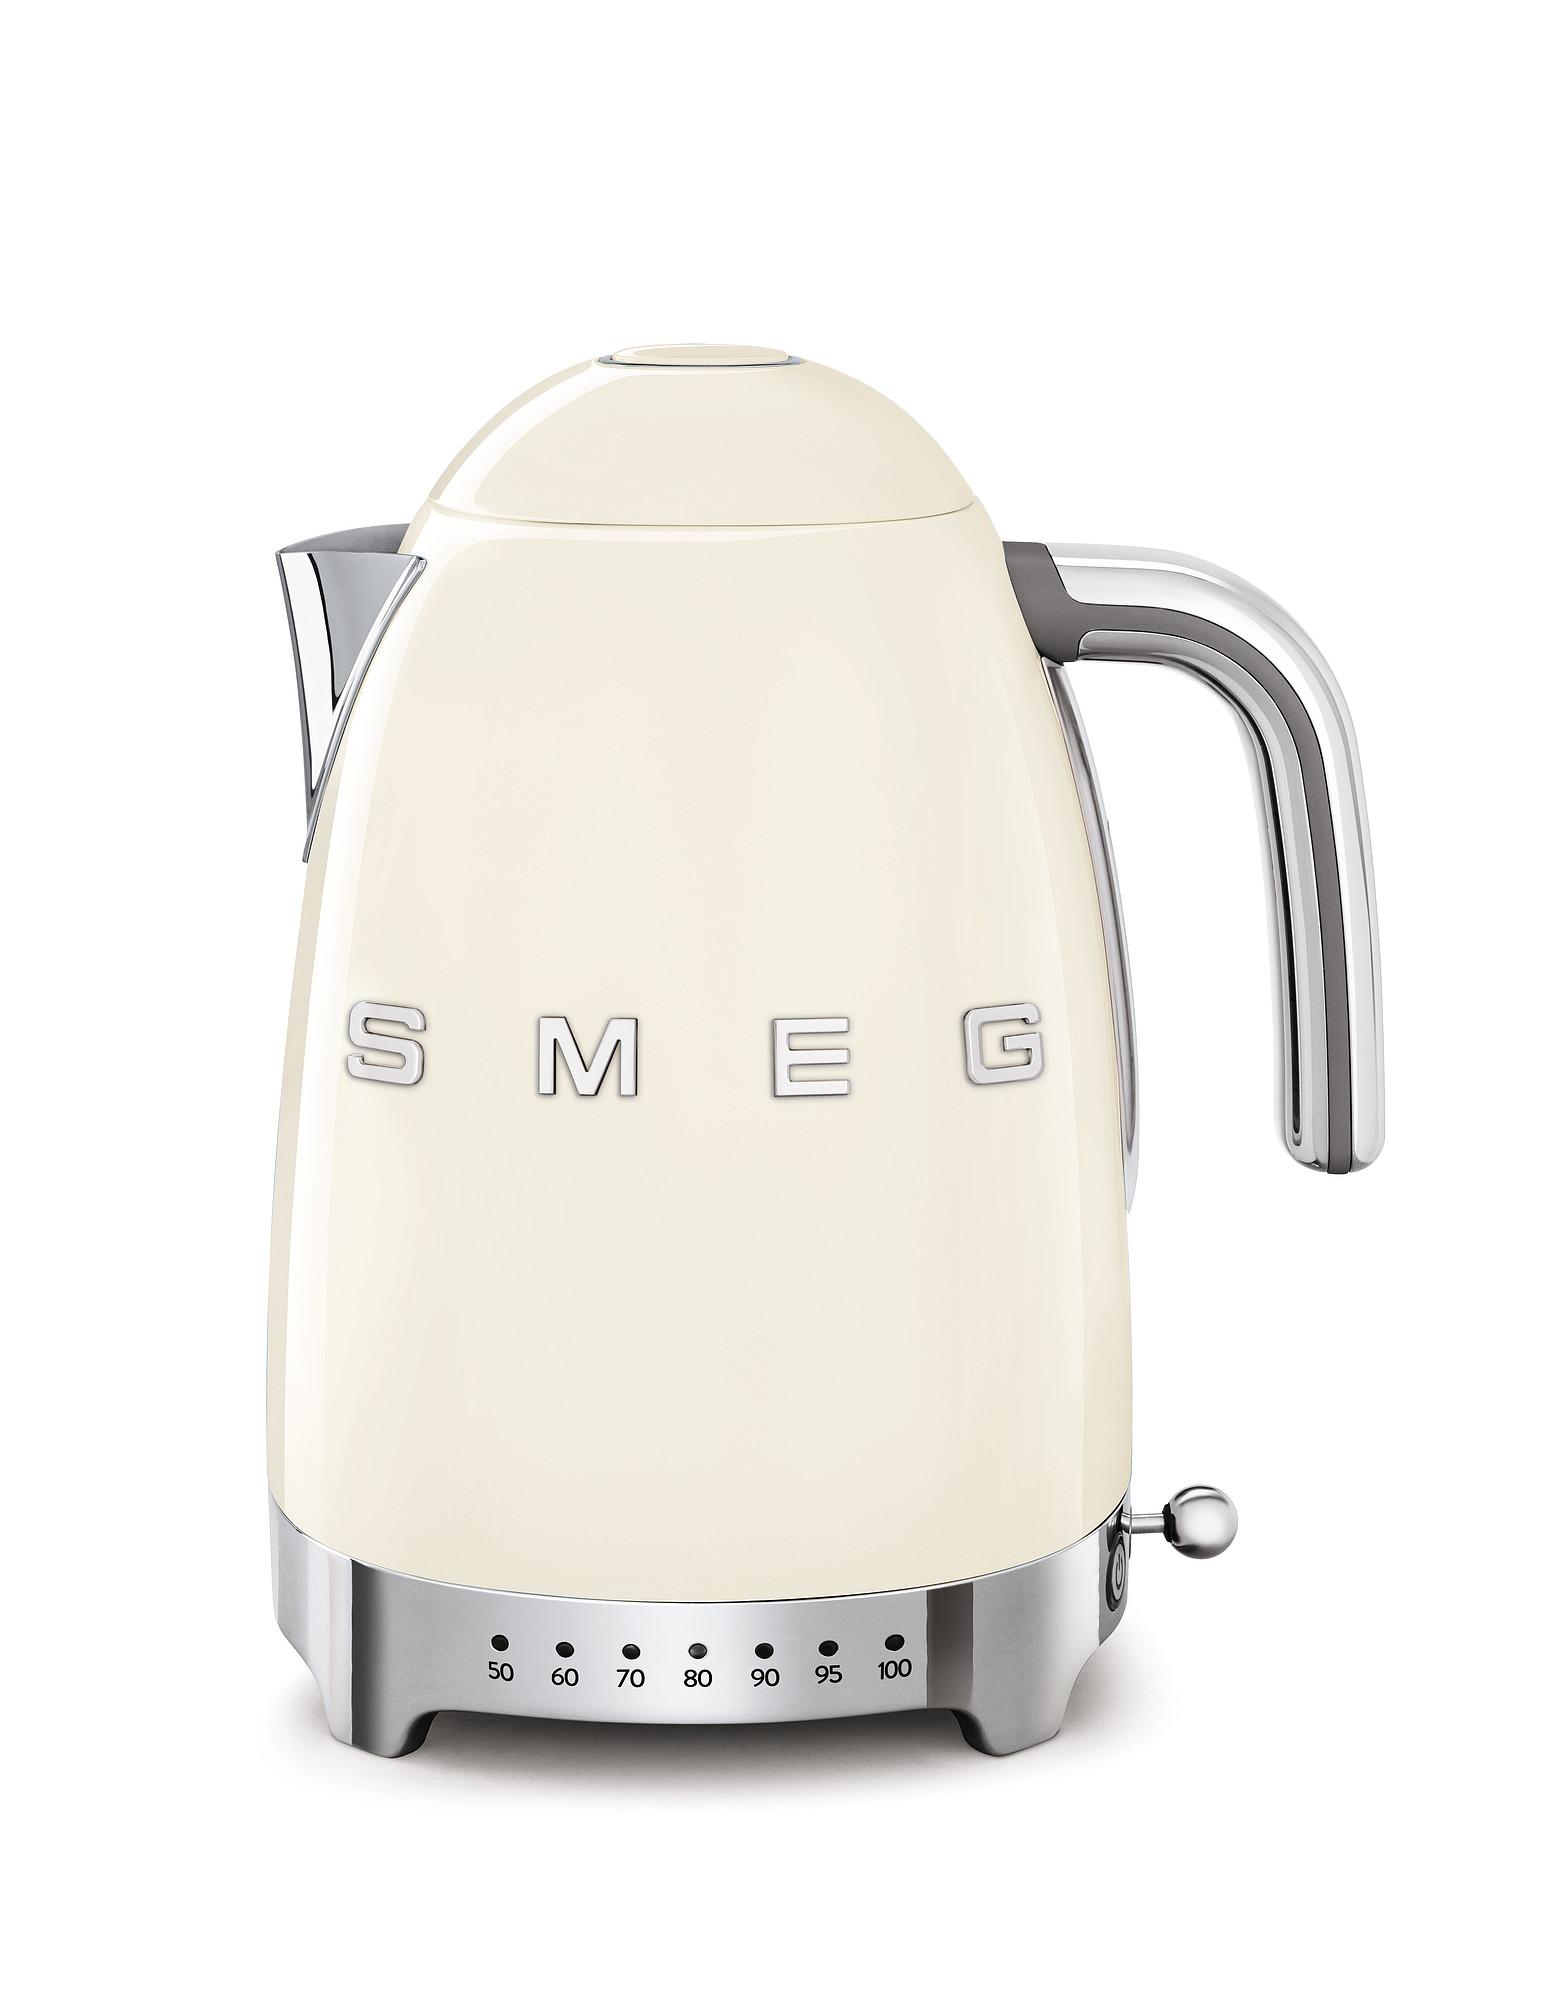 SMEG Wasserkocher Temperaturregelung creme